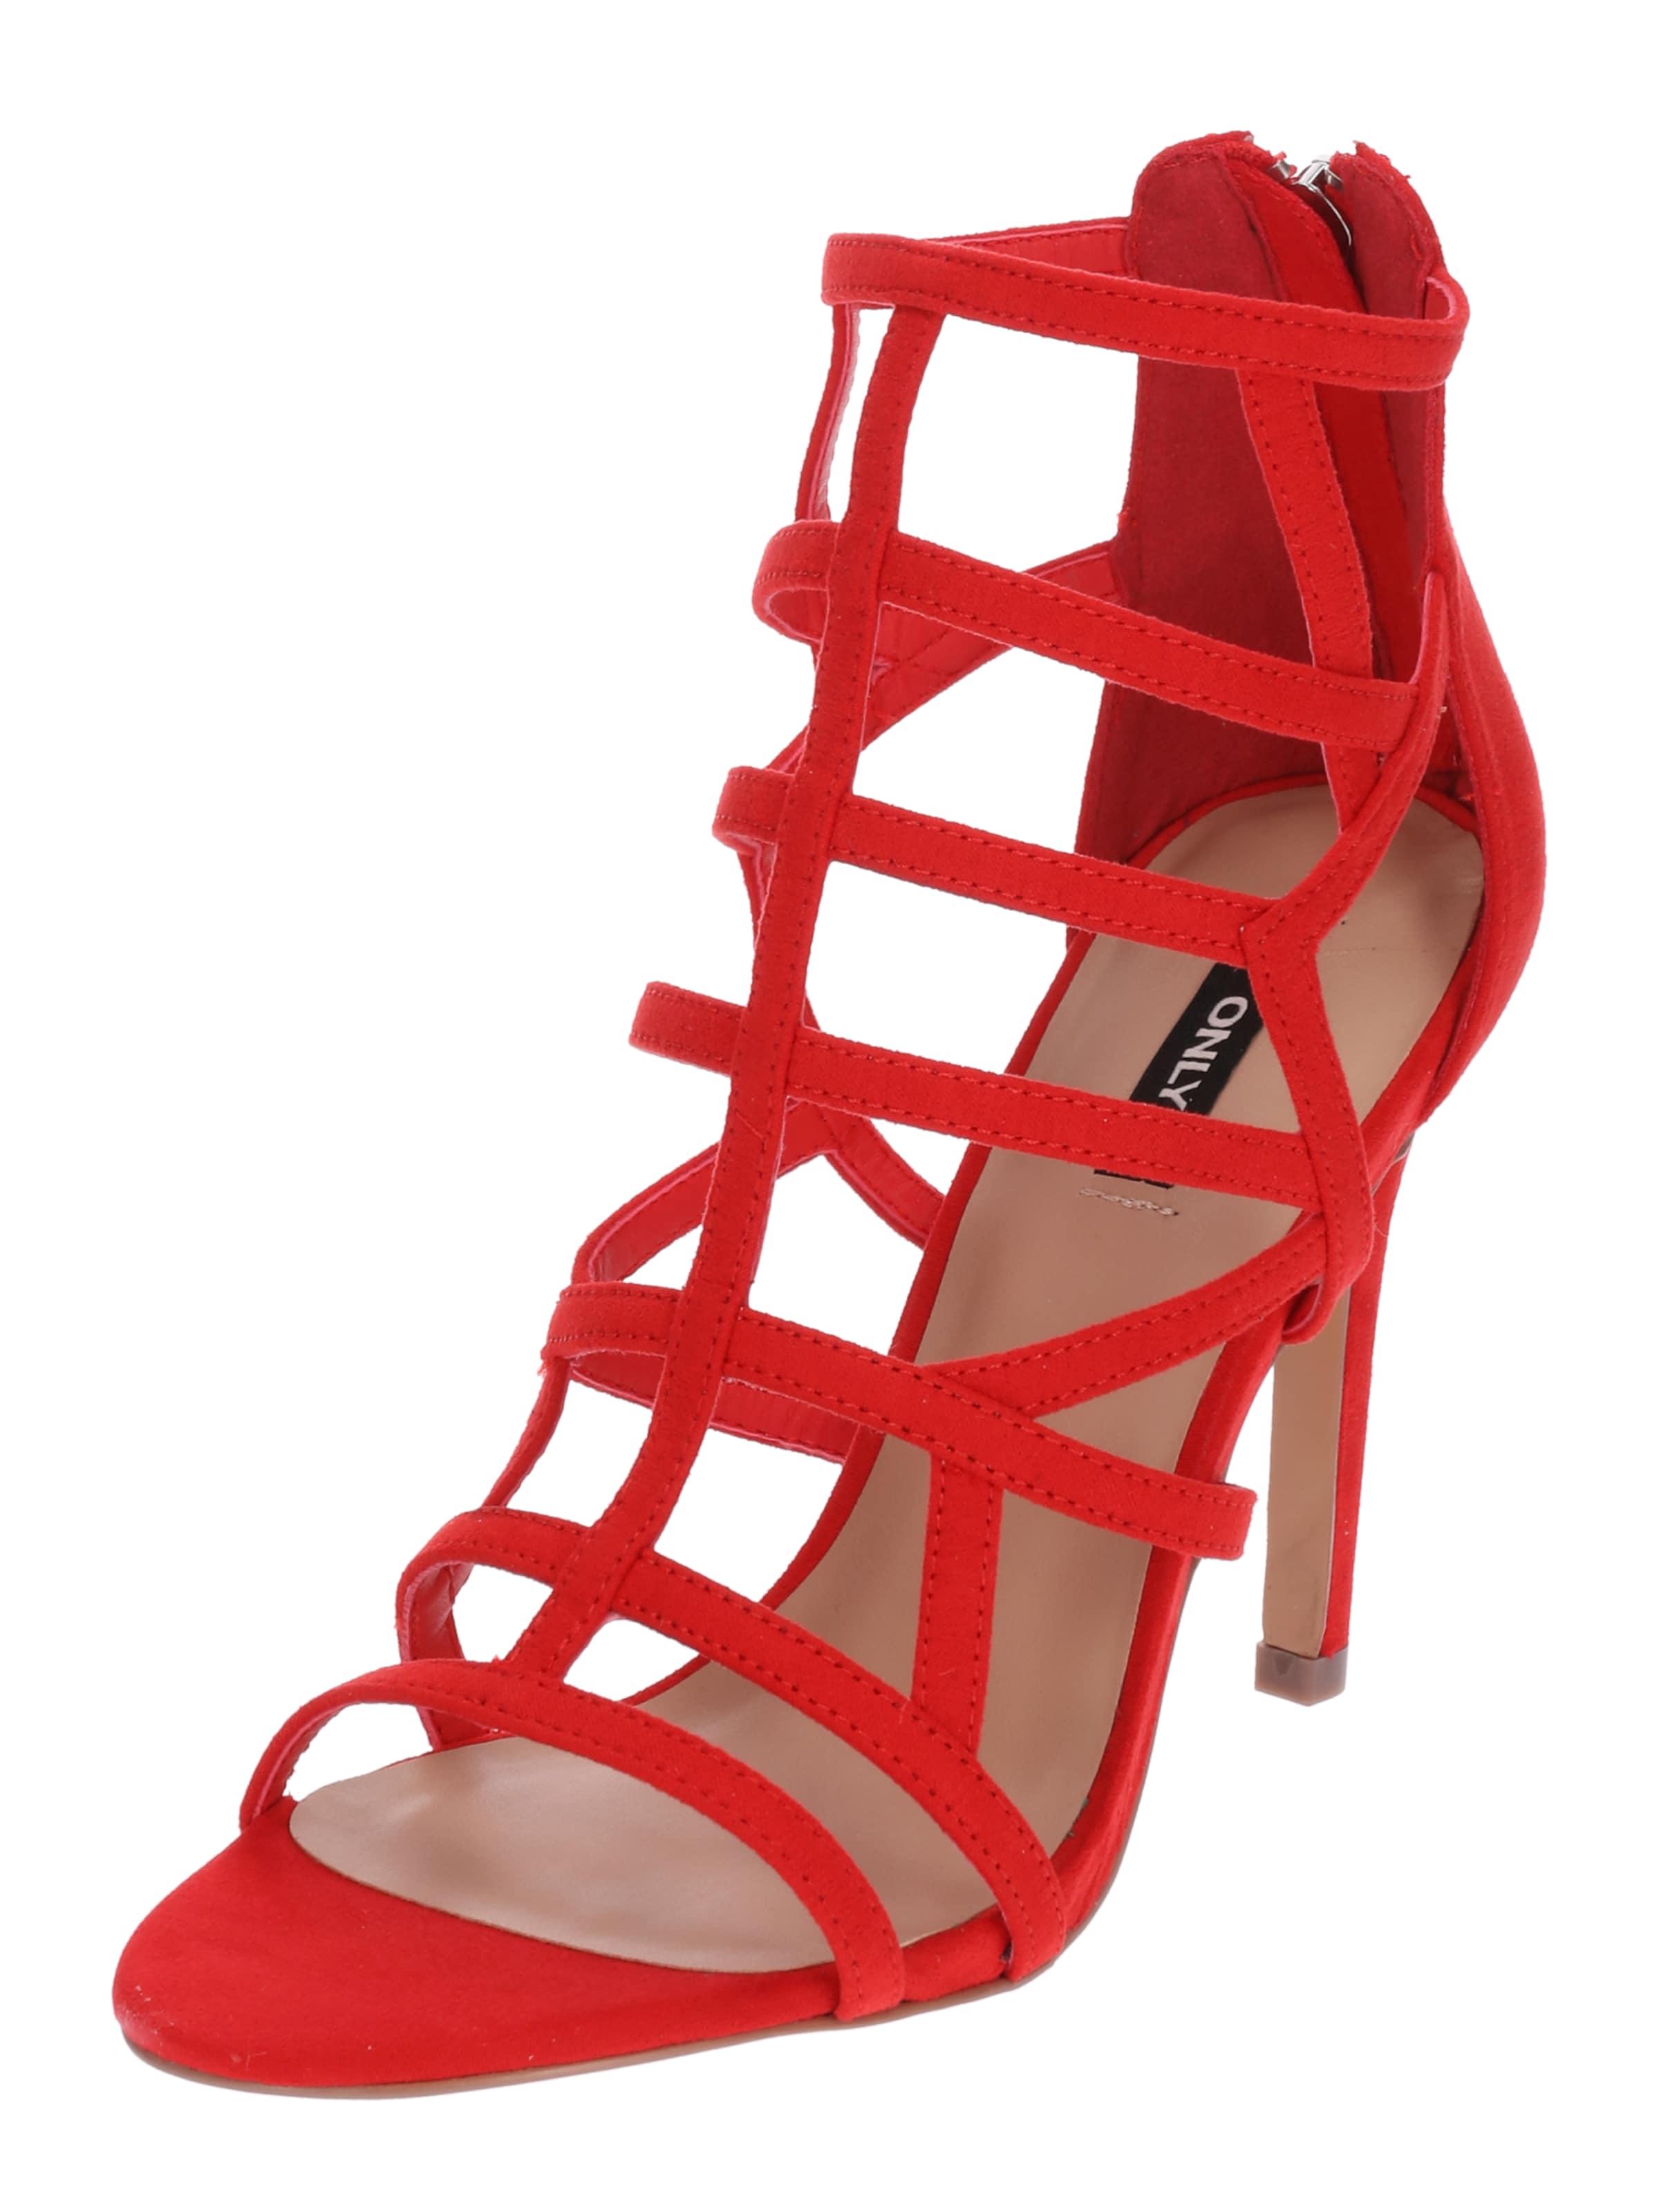 Haltbare Mode billige Schuhe ONLY   Pumps 'CROWN' Schuhe Gut getragene Schuhe